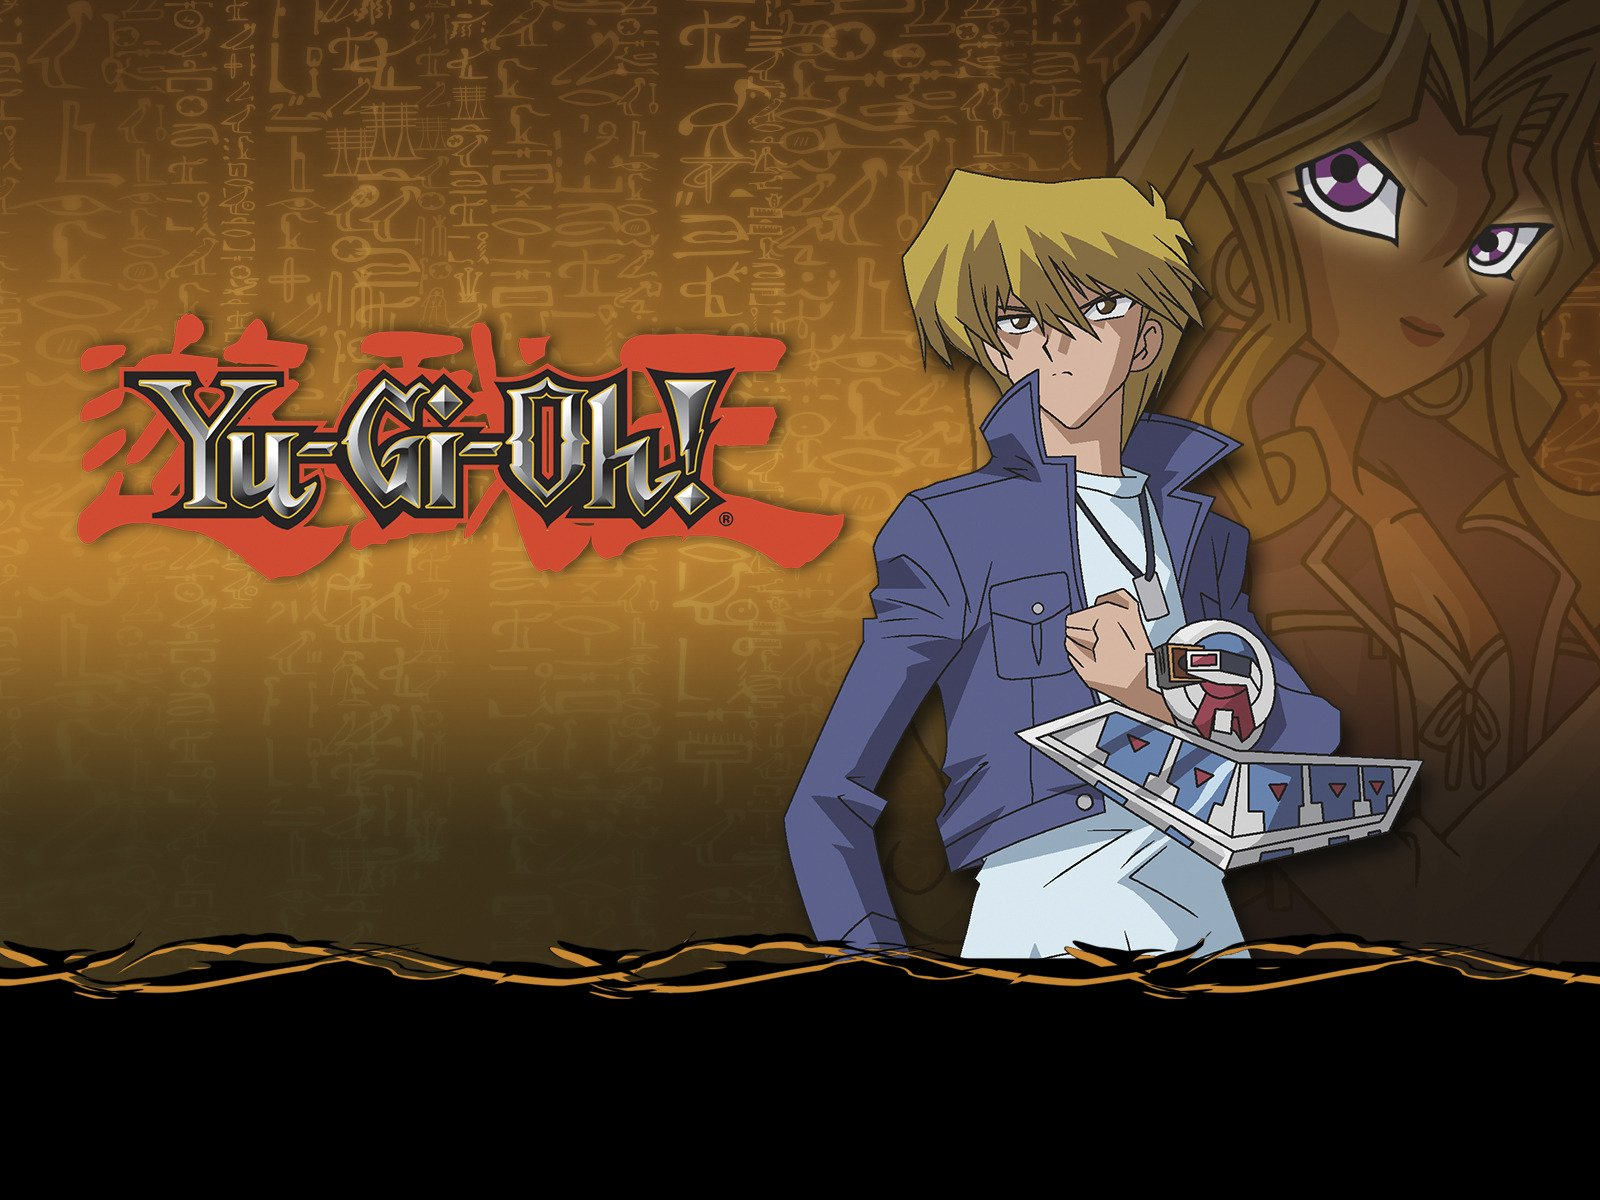 Yu-Gi-Oh! - Season 4